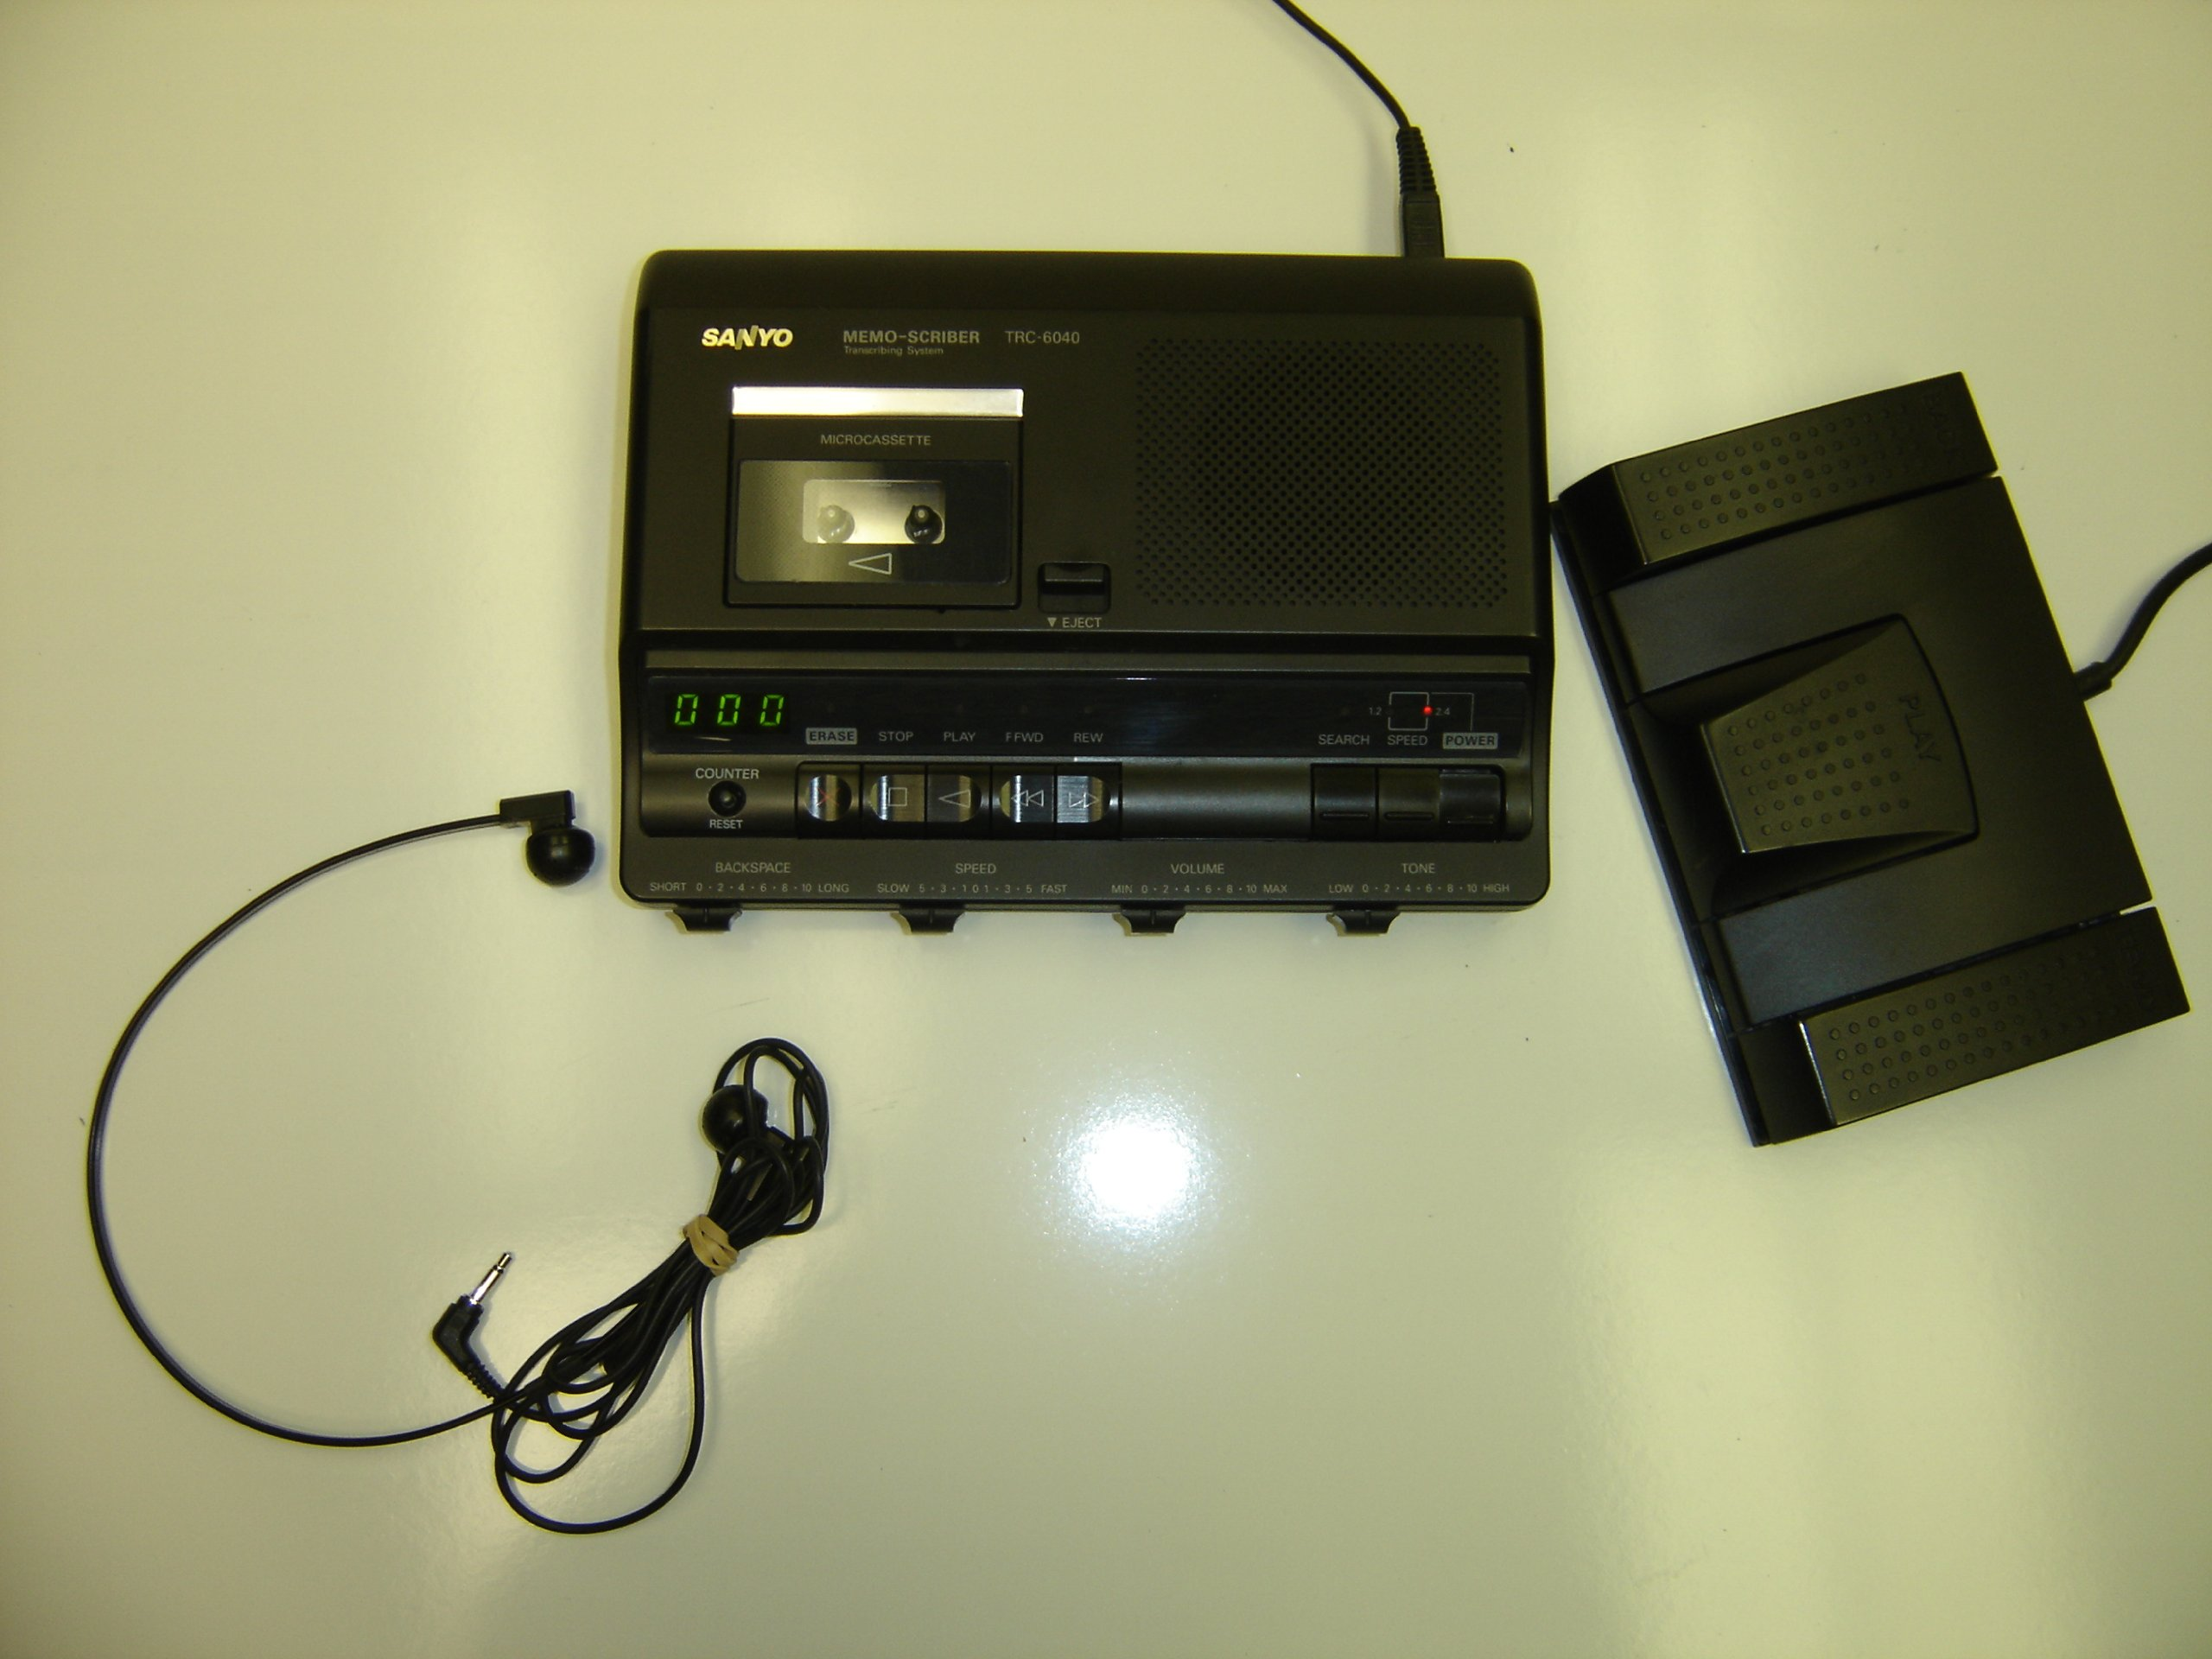 Sanyo TRC-6040 - Microcassette transcriber - black